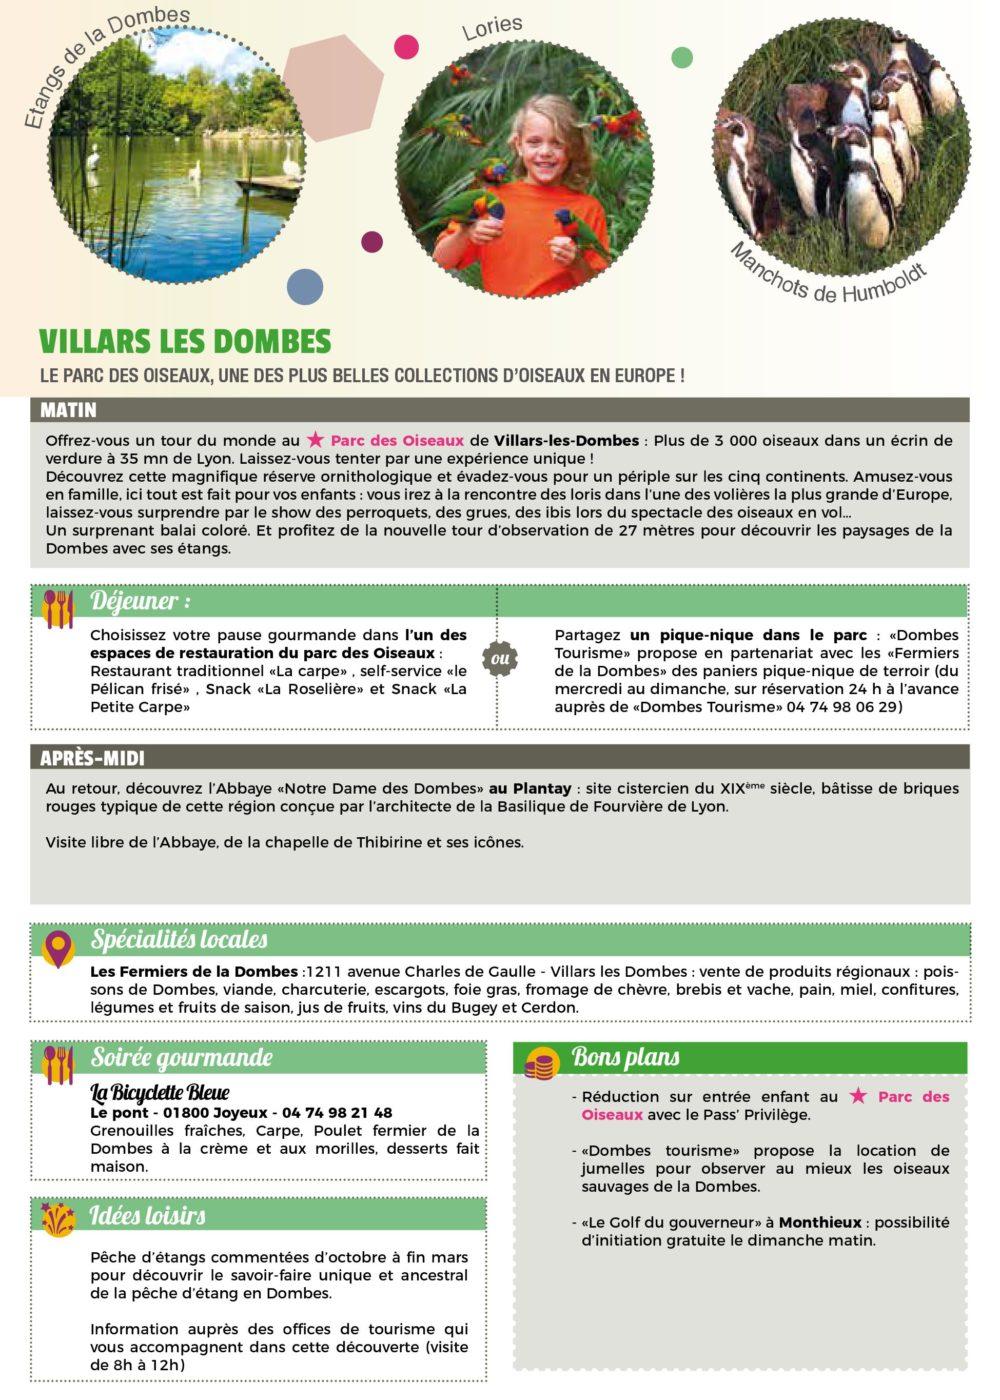 carnet de voyage 2019 - saone - page 5 villars les dombes